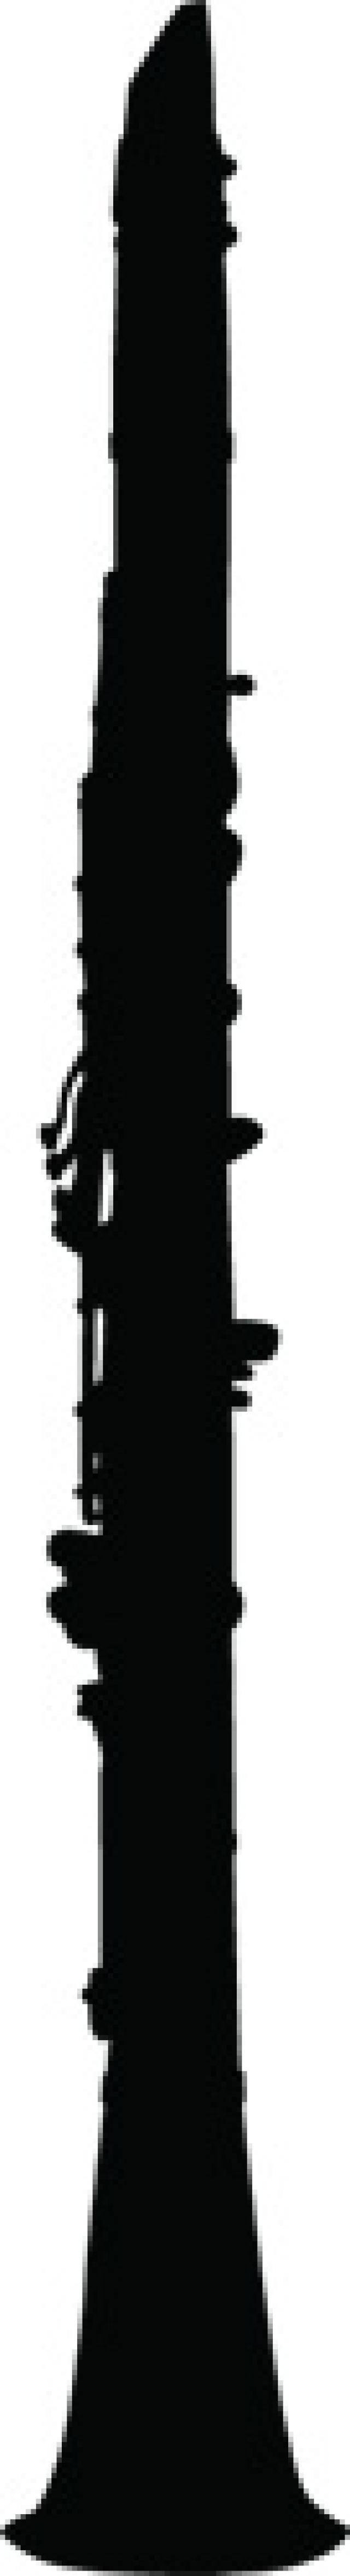 640x4706 Free Trombone Silhouette Cliparts, Hanslodge Clip Art Collection